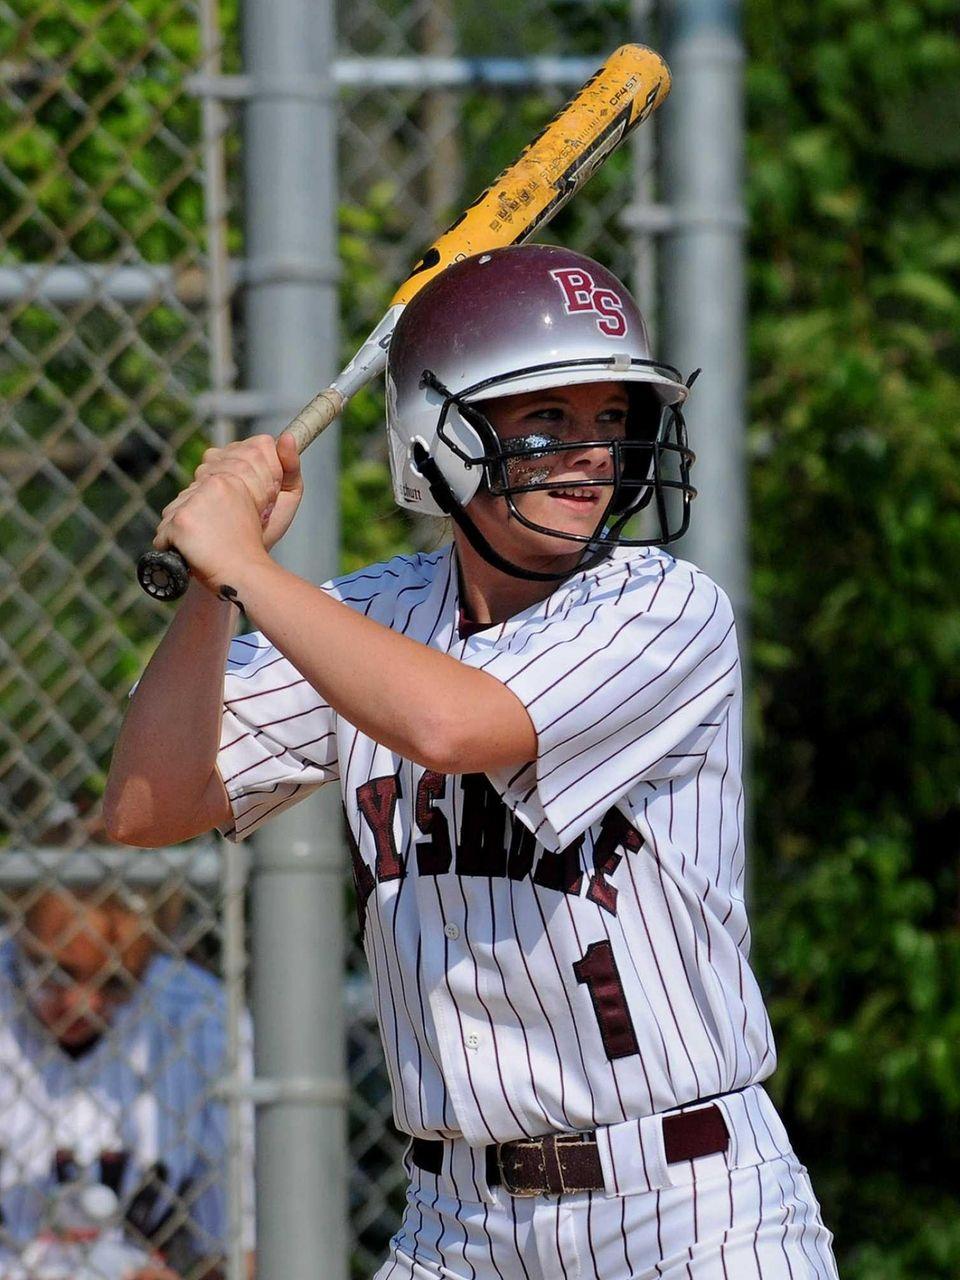 Bay Shore catcher Courtney Syrett steps into the